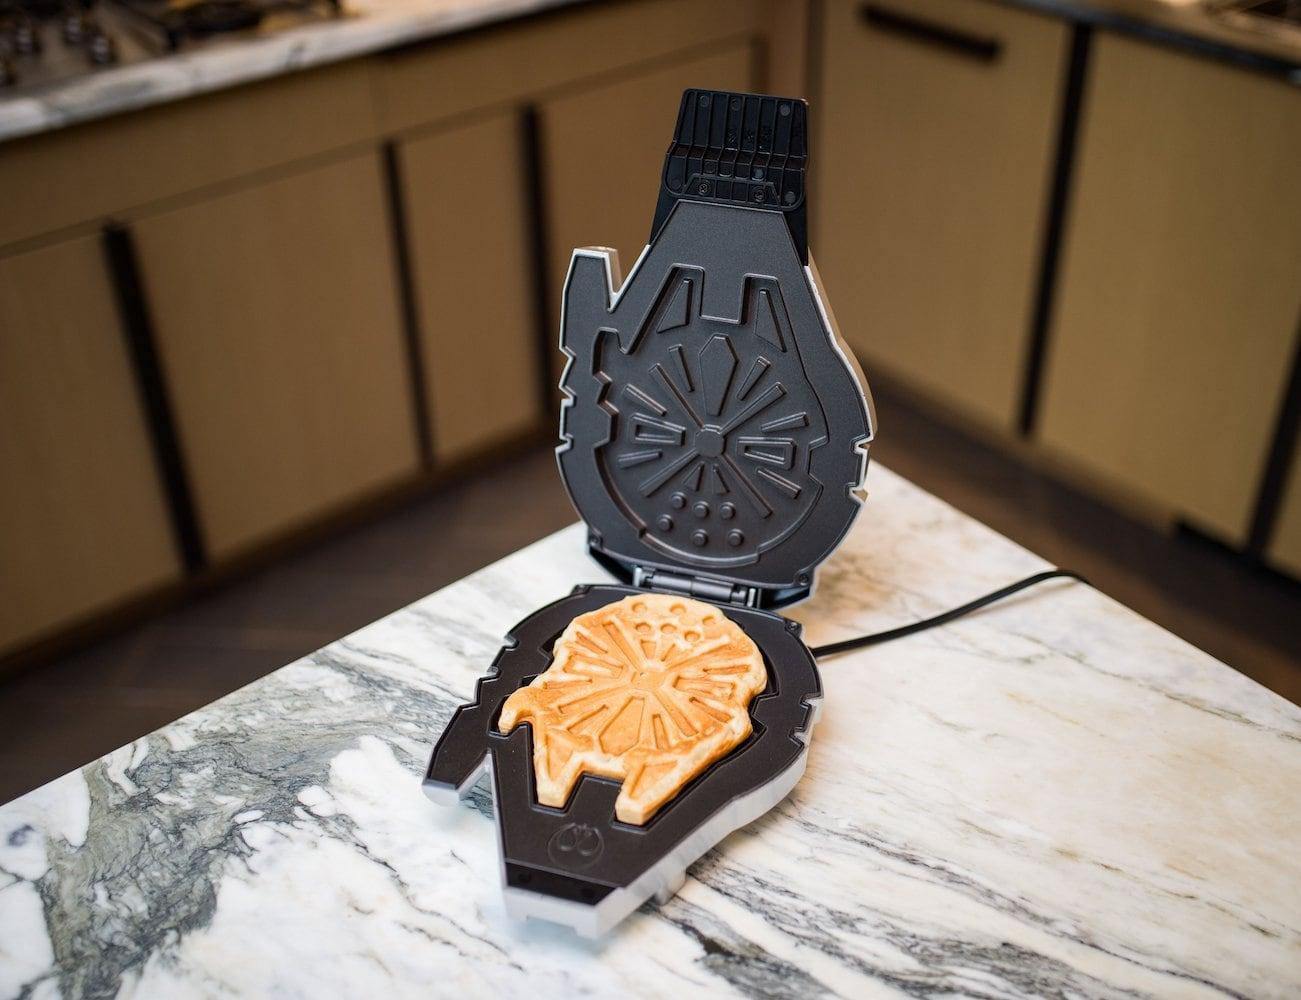 Pangea Brands Deluxe Millennium Falcon Waffle Maker